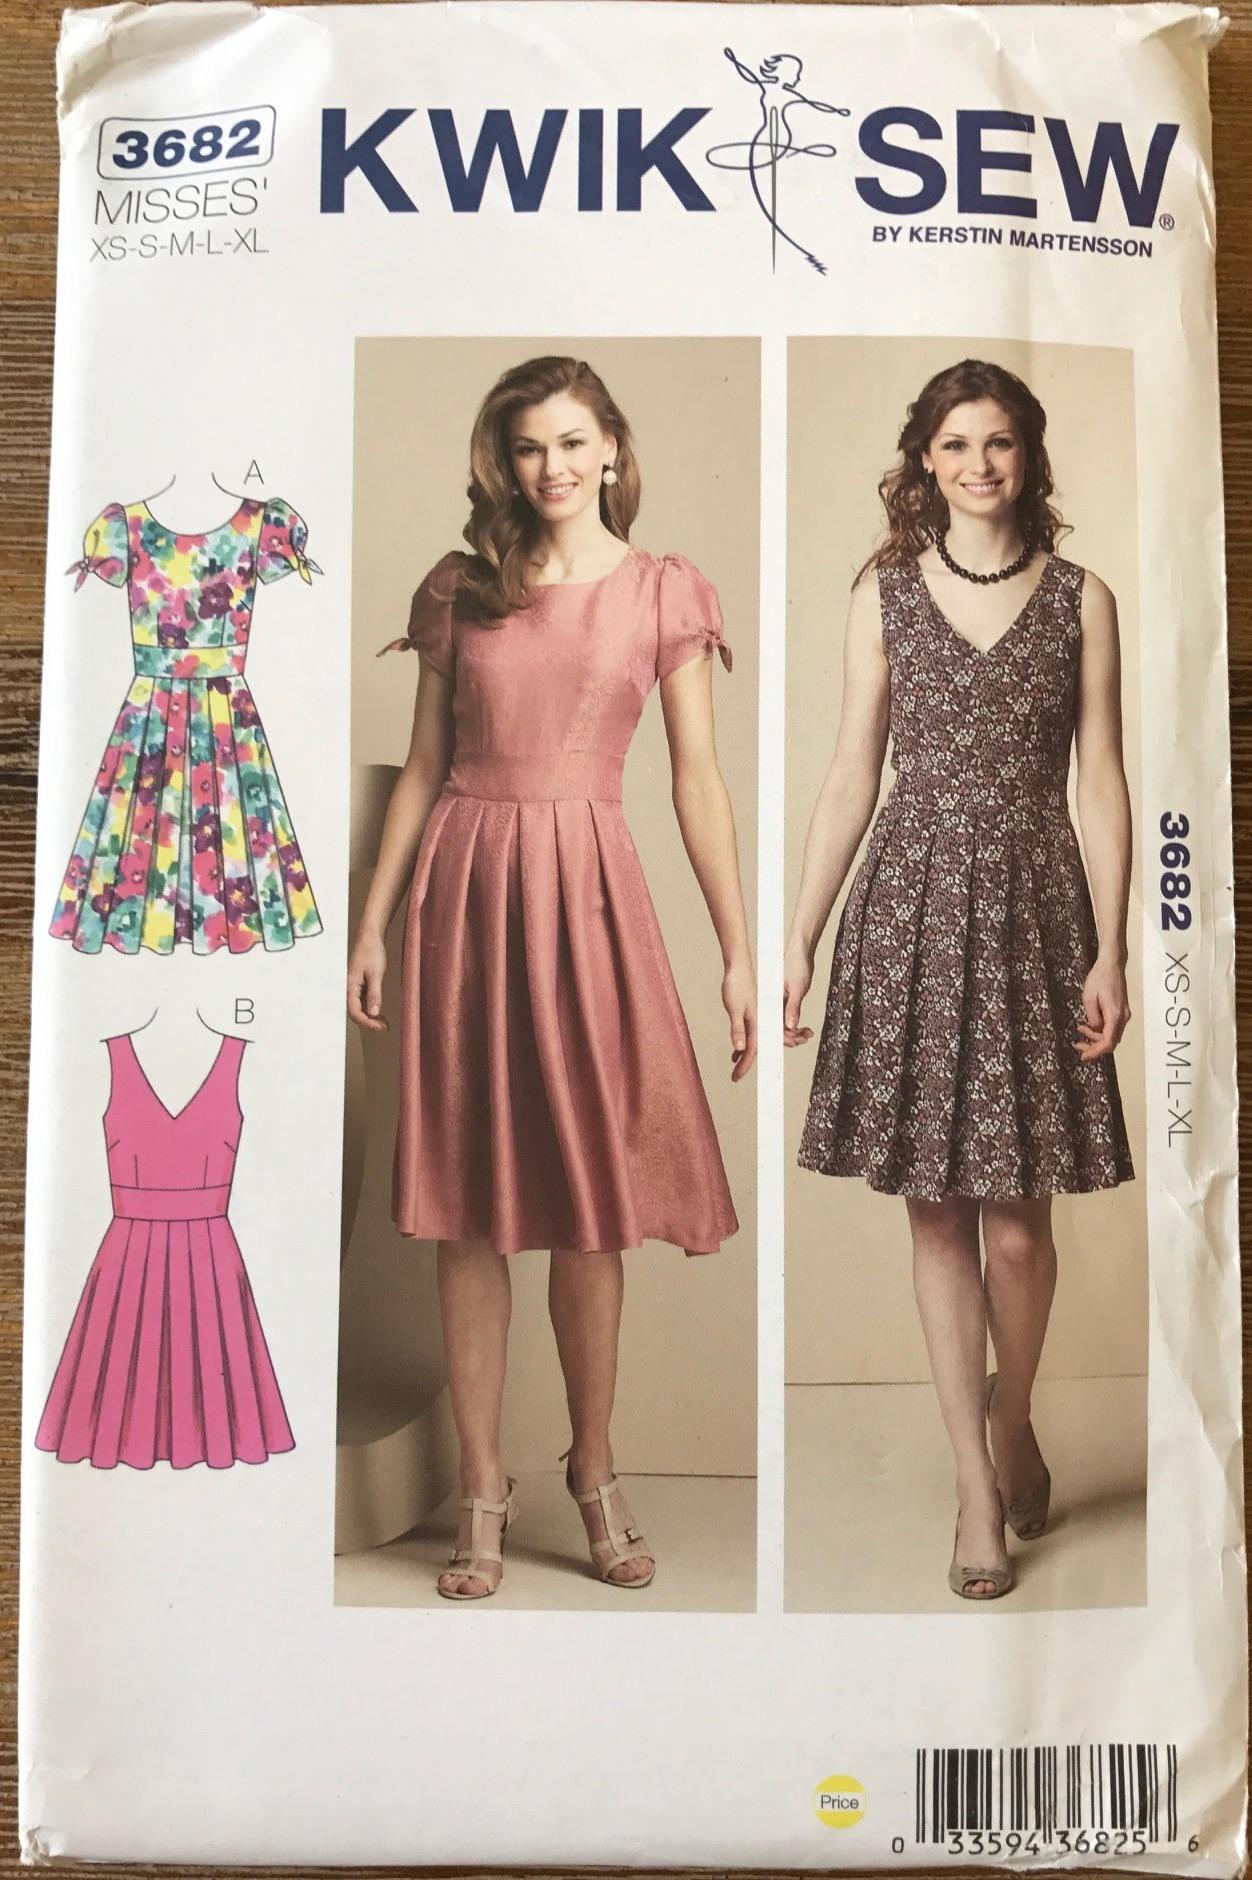 UNBESCHNITTENEN Kwik Nähen 3682 Kleid nähen Muster Größe XS-XL